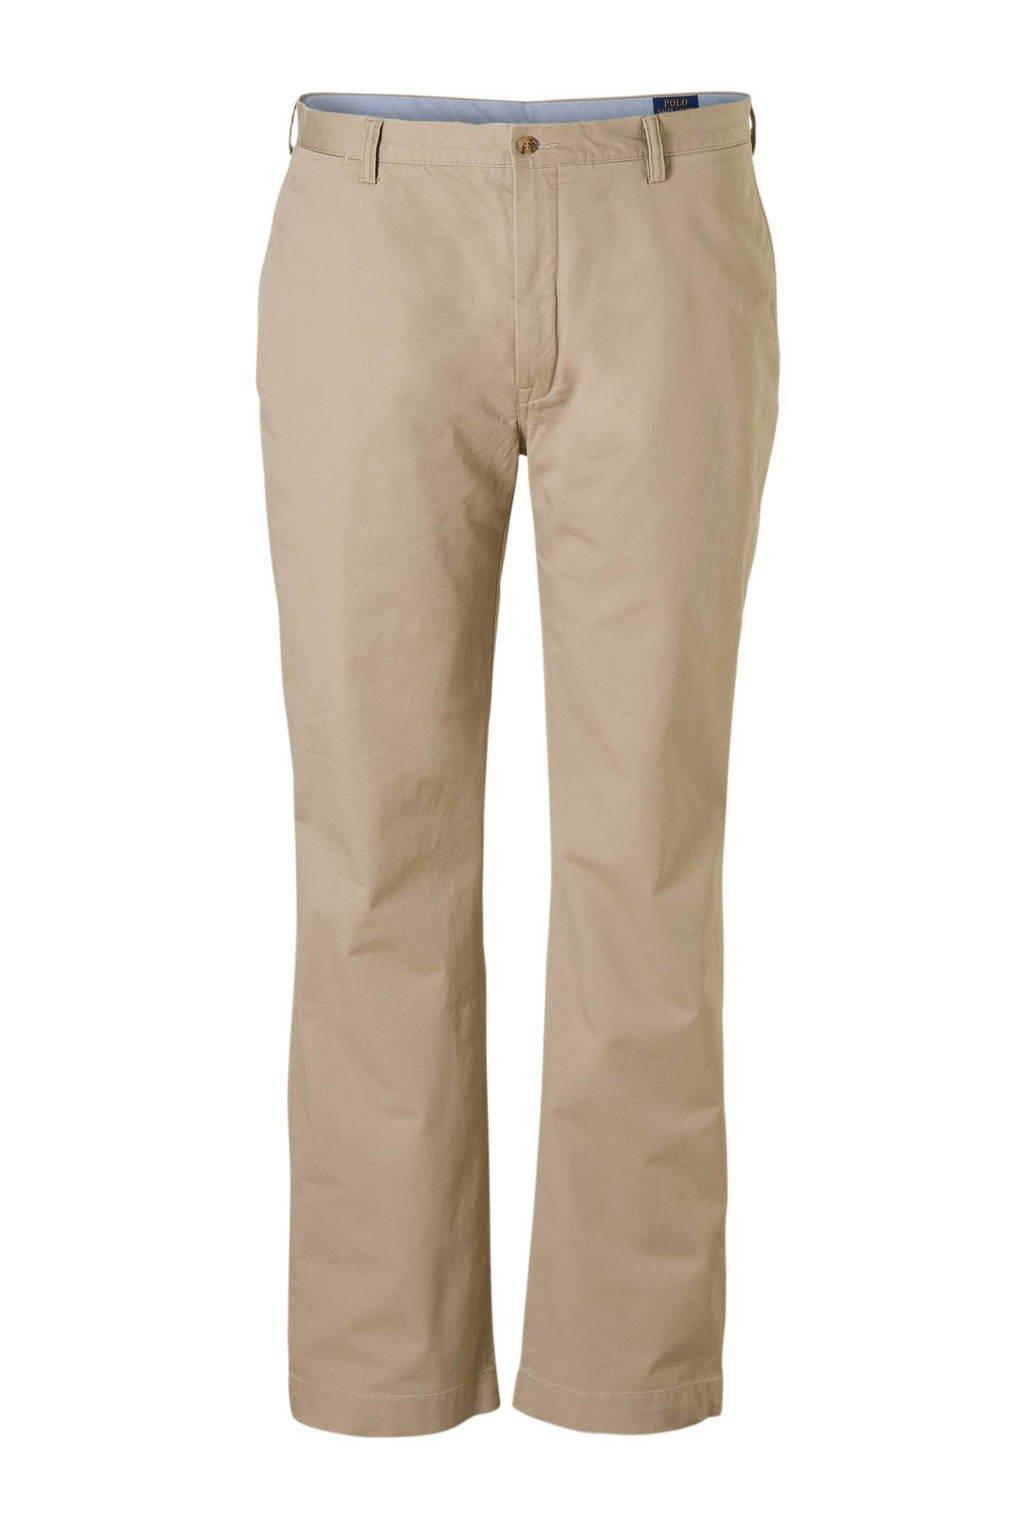 POLO Ralph Lauren Big & Tall +size classic fit pantalon, Beige